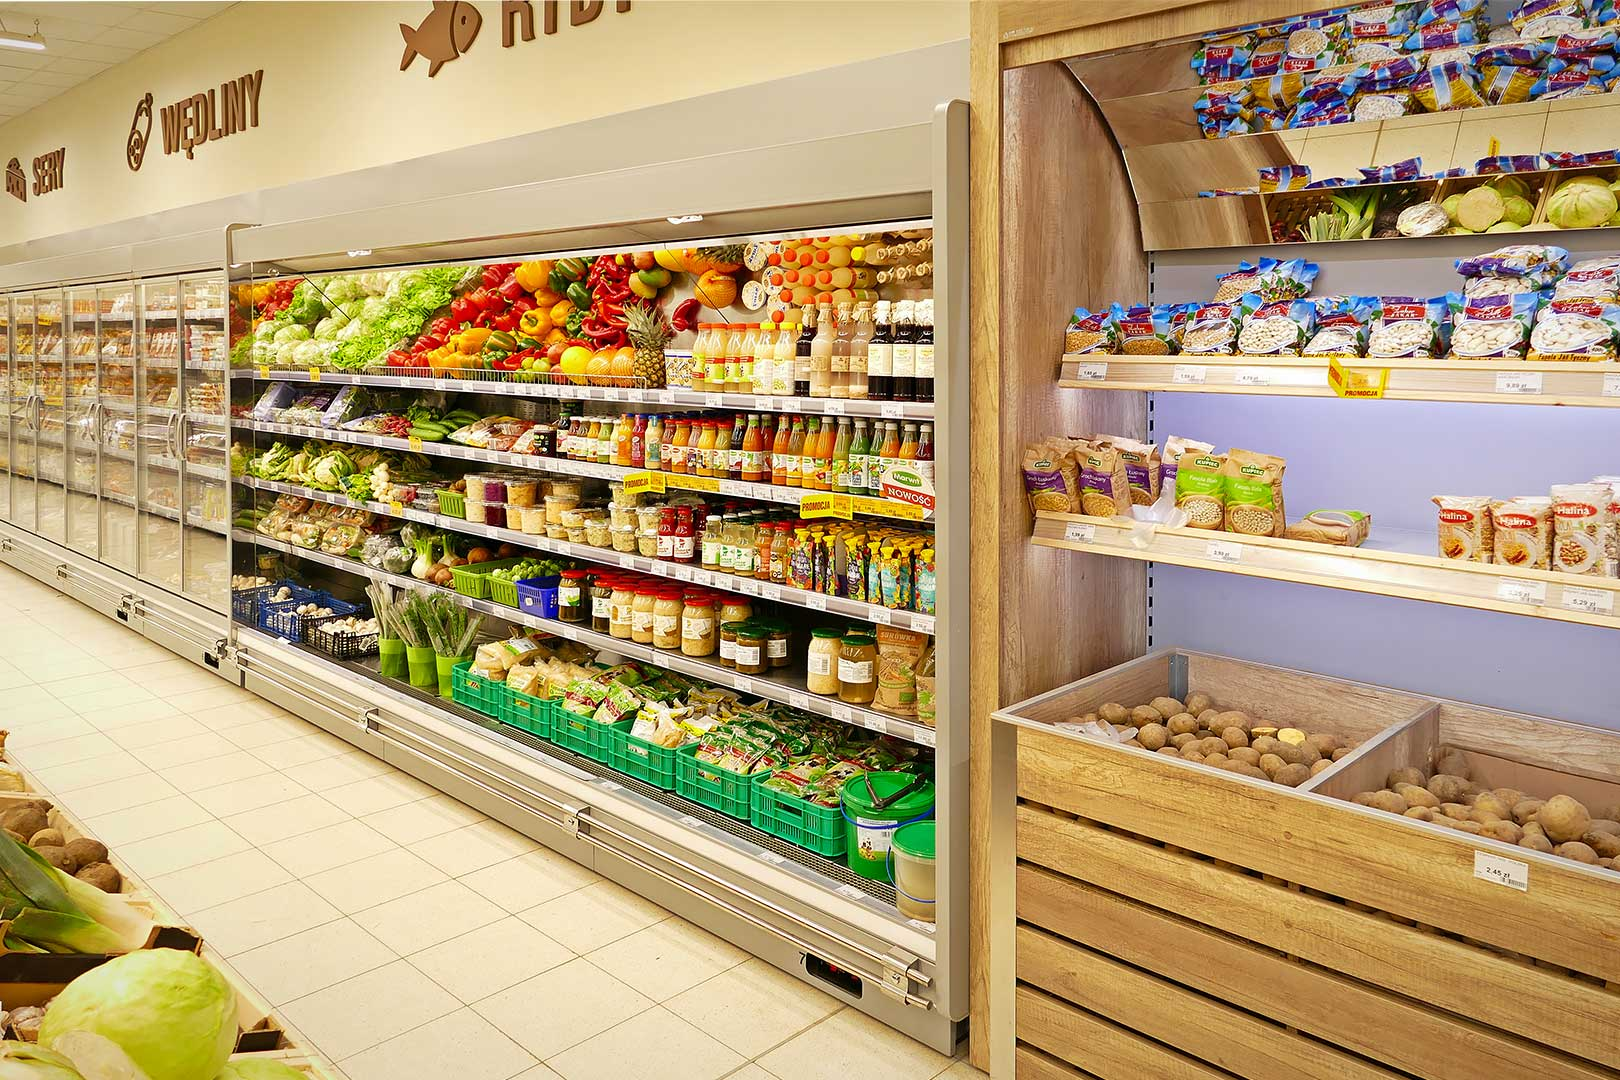 Specialized units for vegetables and fruit sales Louisiana FV MV 095 VF О 210-DLM, multideck cabinets Louisiana MV 095 MT D 210-DLM